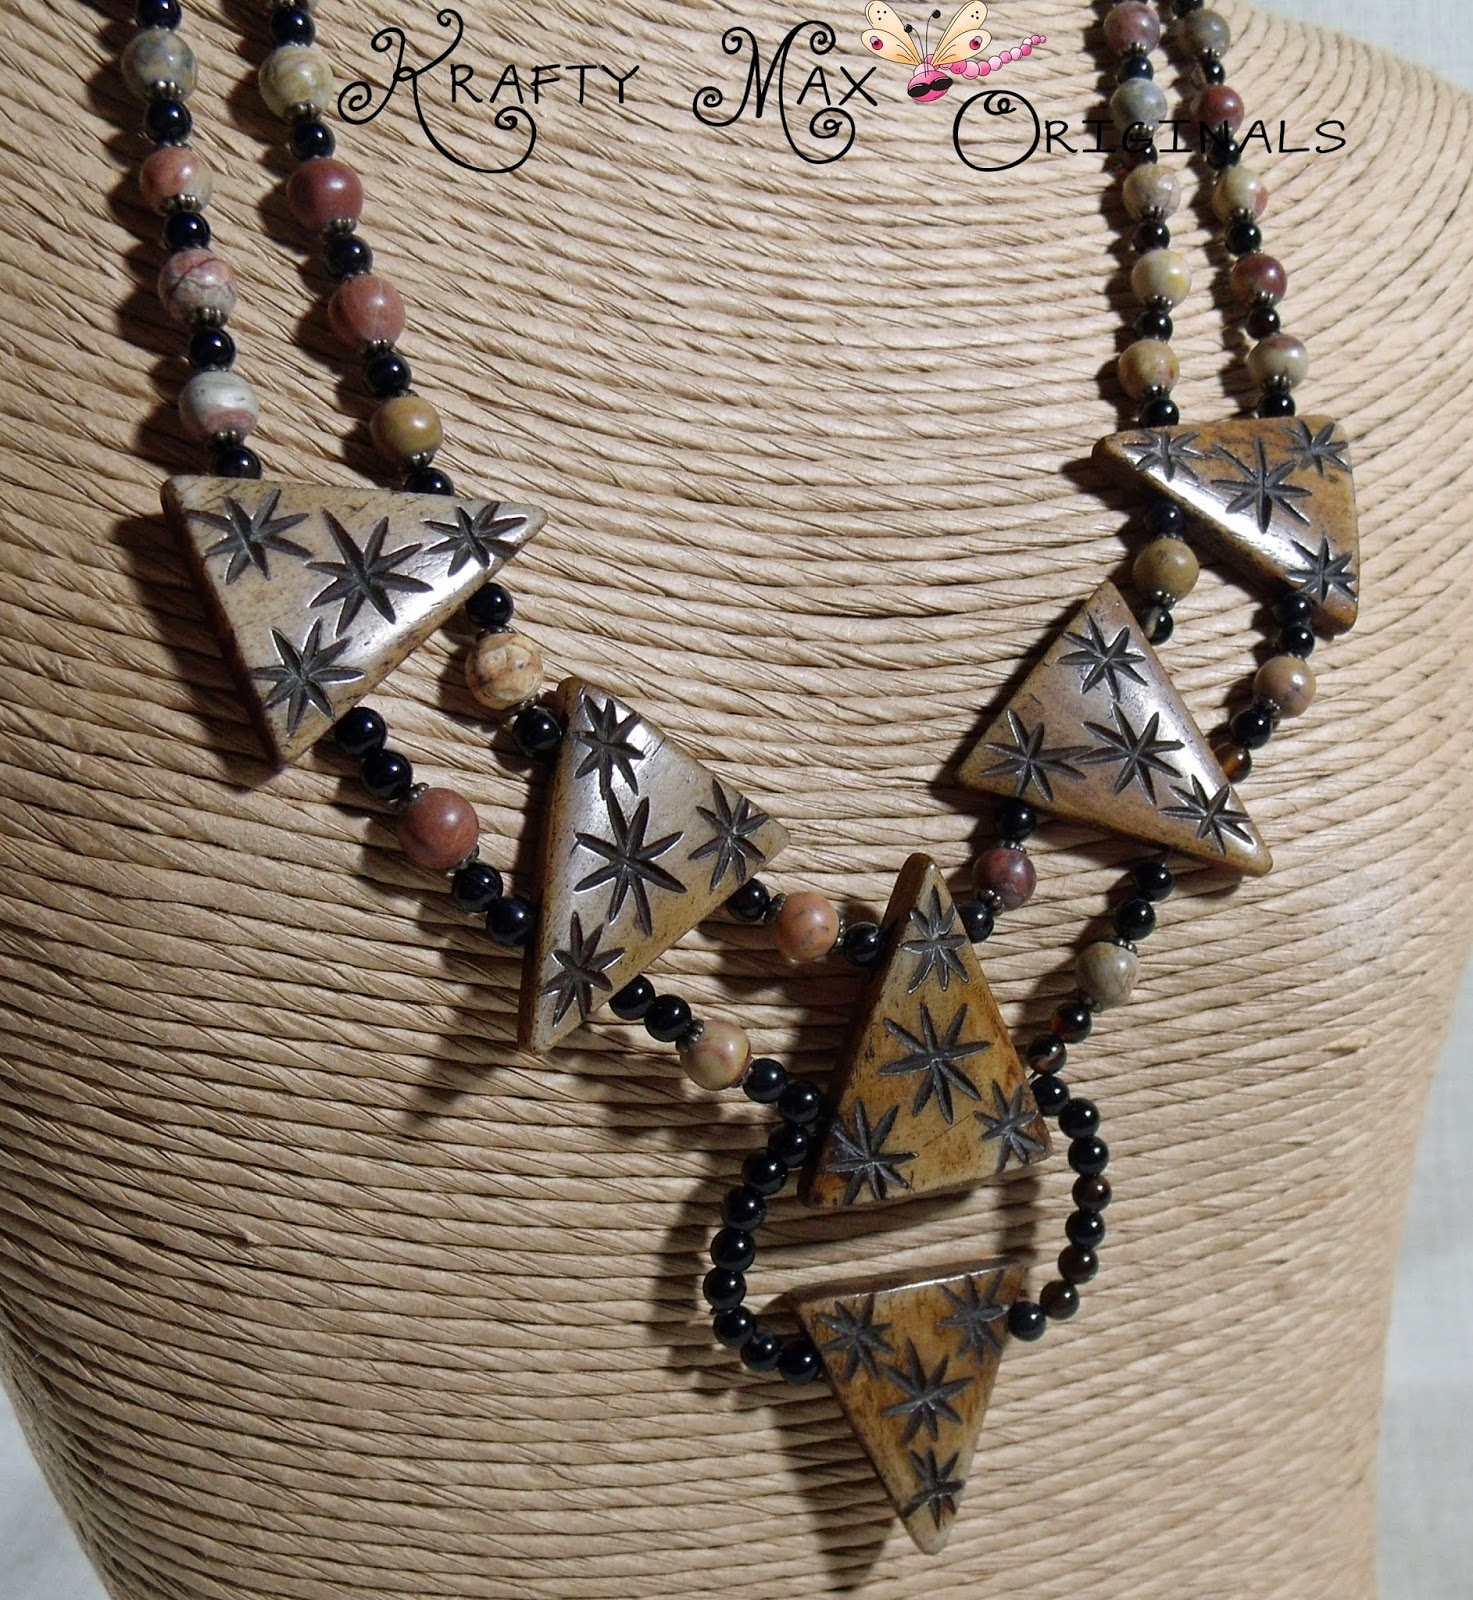 http://www.artfire.com/ext/shop/product_view/9740884